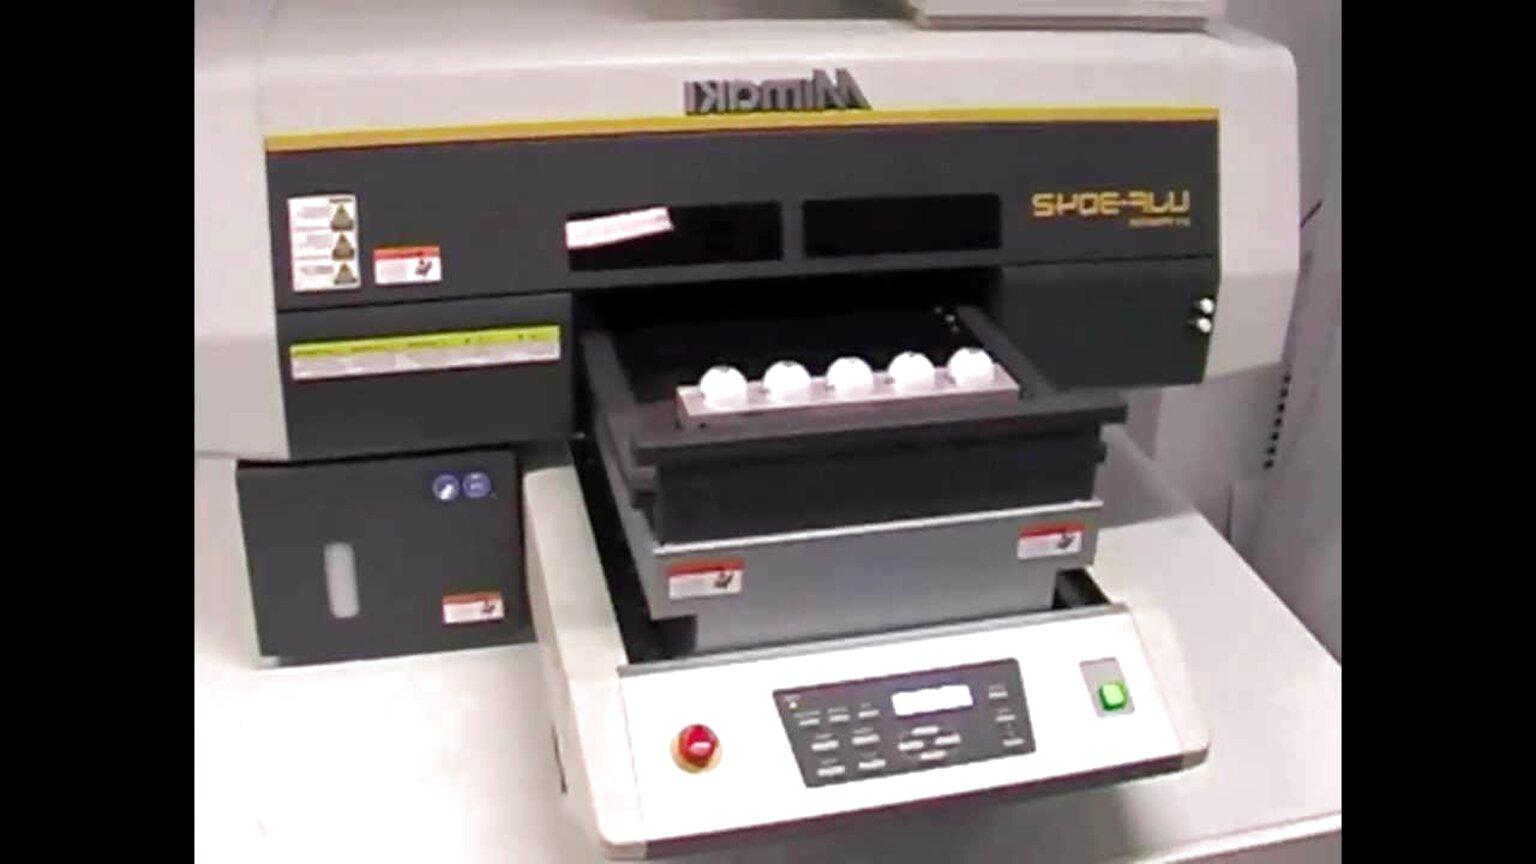 uv printer for sale